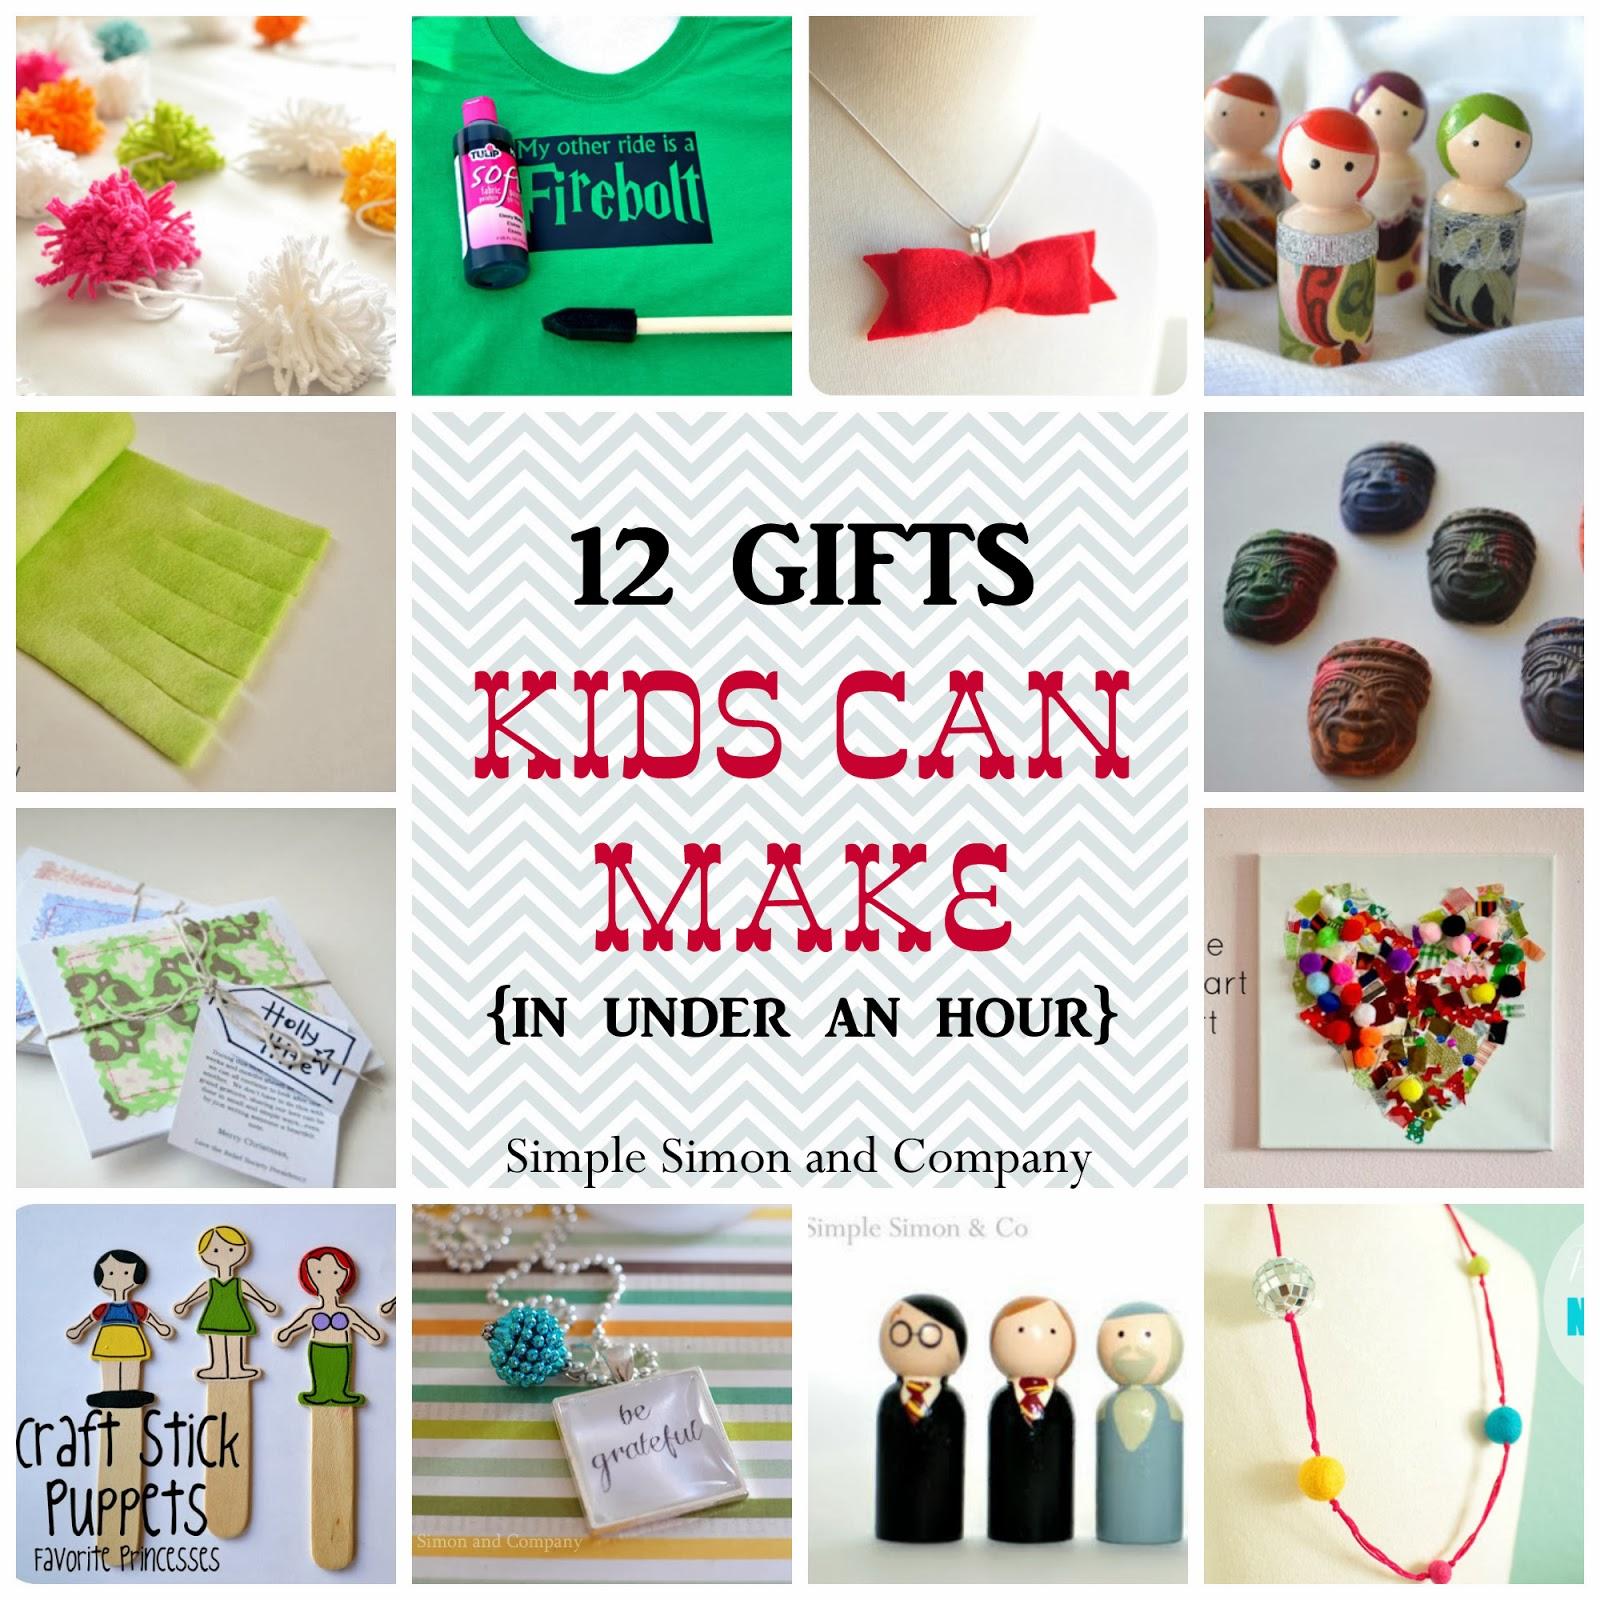 12 gifts kids can make..... - Simple Simon and Company